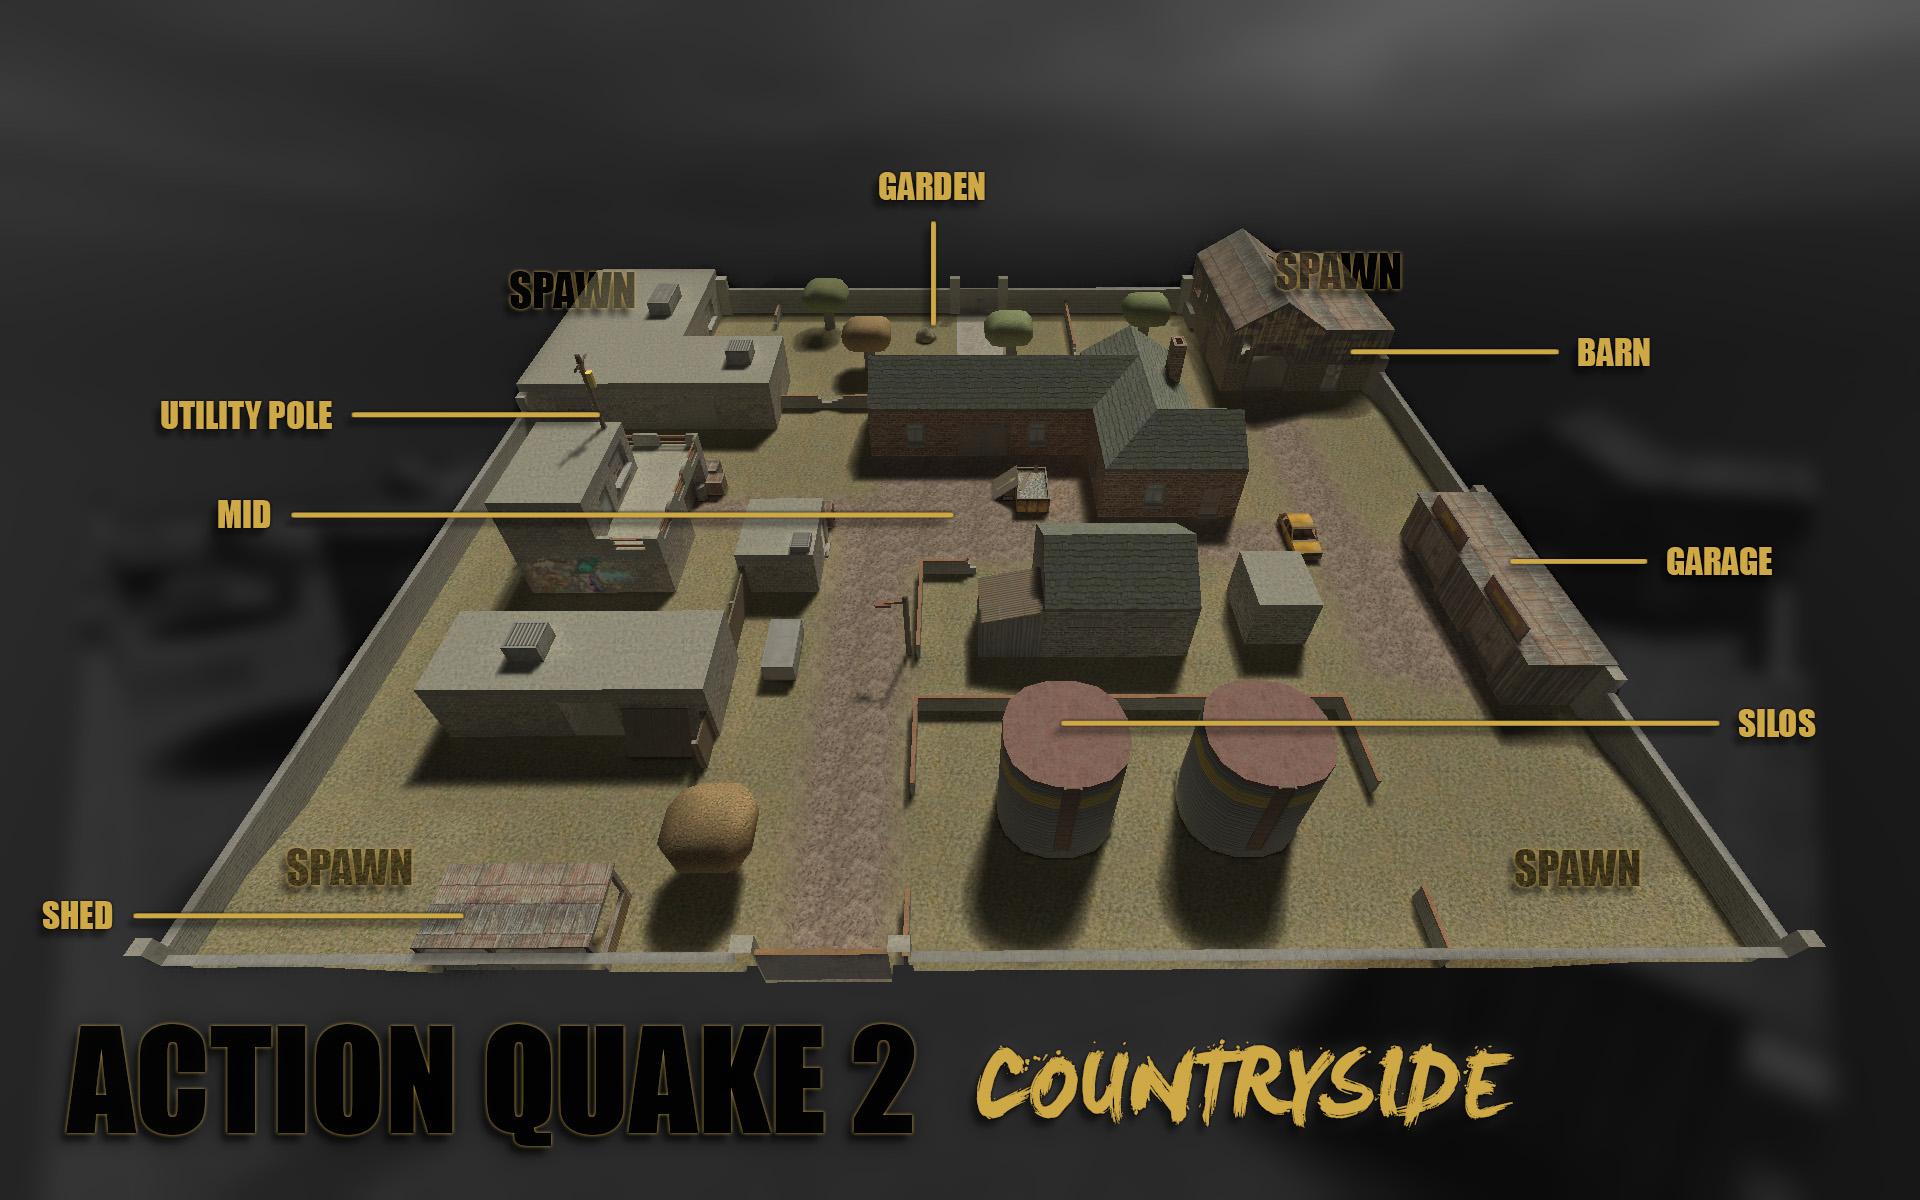 Action quake 2 file mod db.